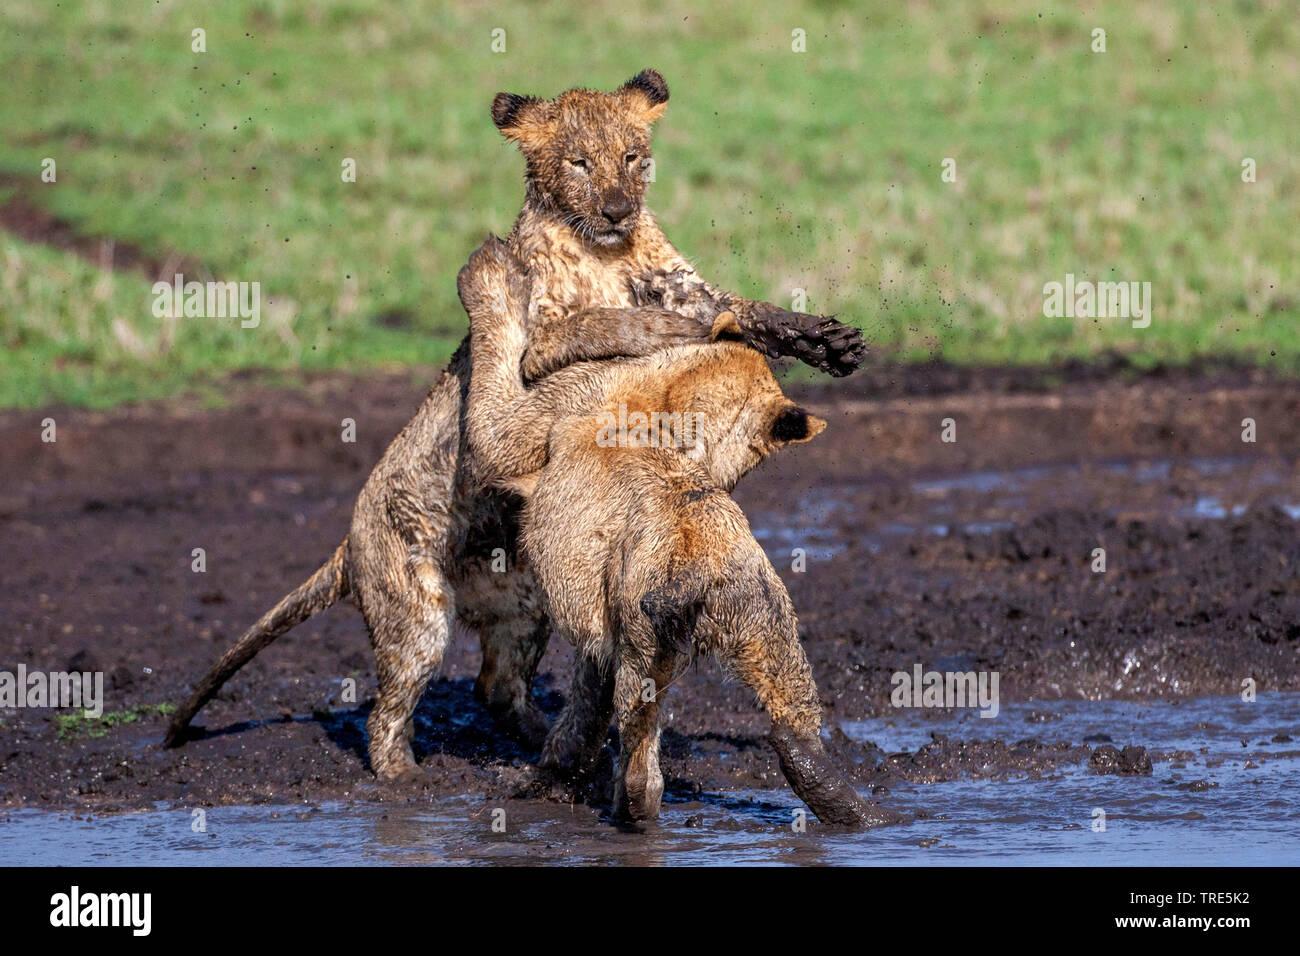 lion (Panthera leo), two lion cubs scuffling in a mud hole, Kenya, Masai Mara National Park Stock Photo